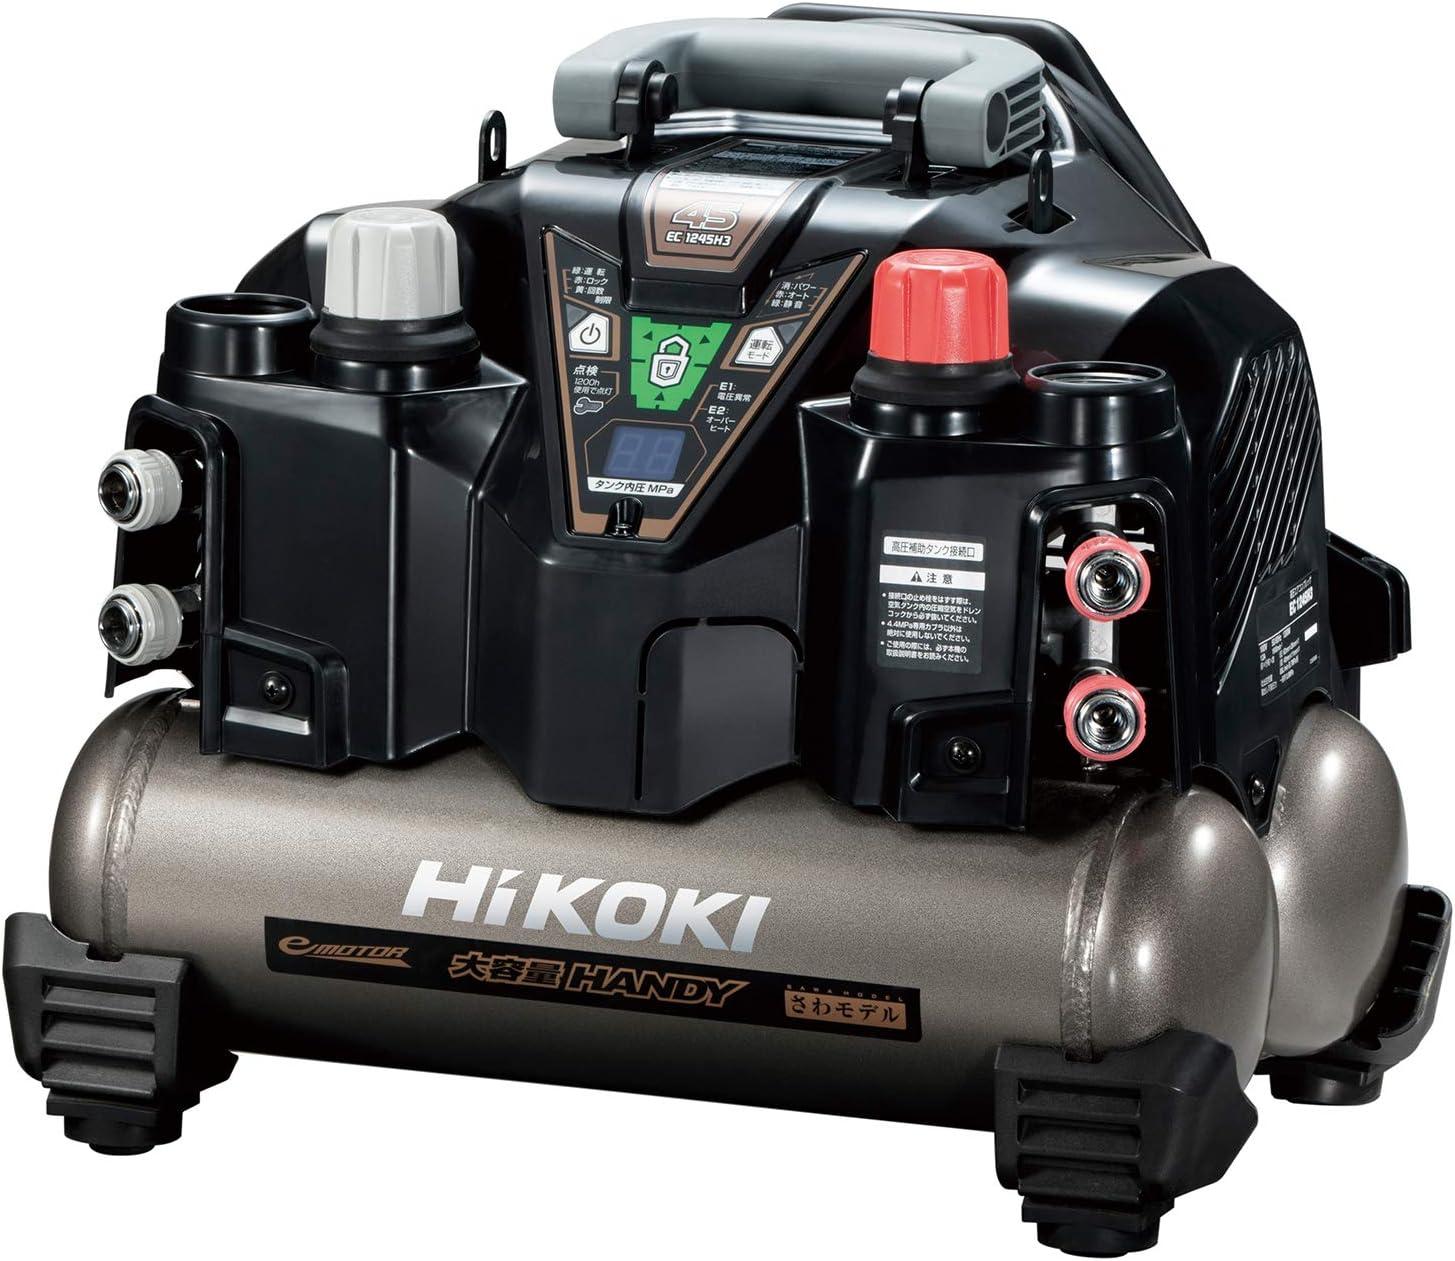 <br /> HiKOKI(ハイコーキ) 旧日立工機 釘打機用エアコンプレッサ タンク容量8L